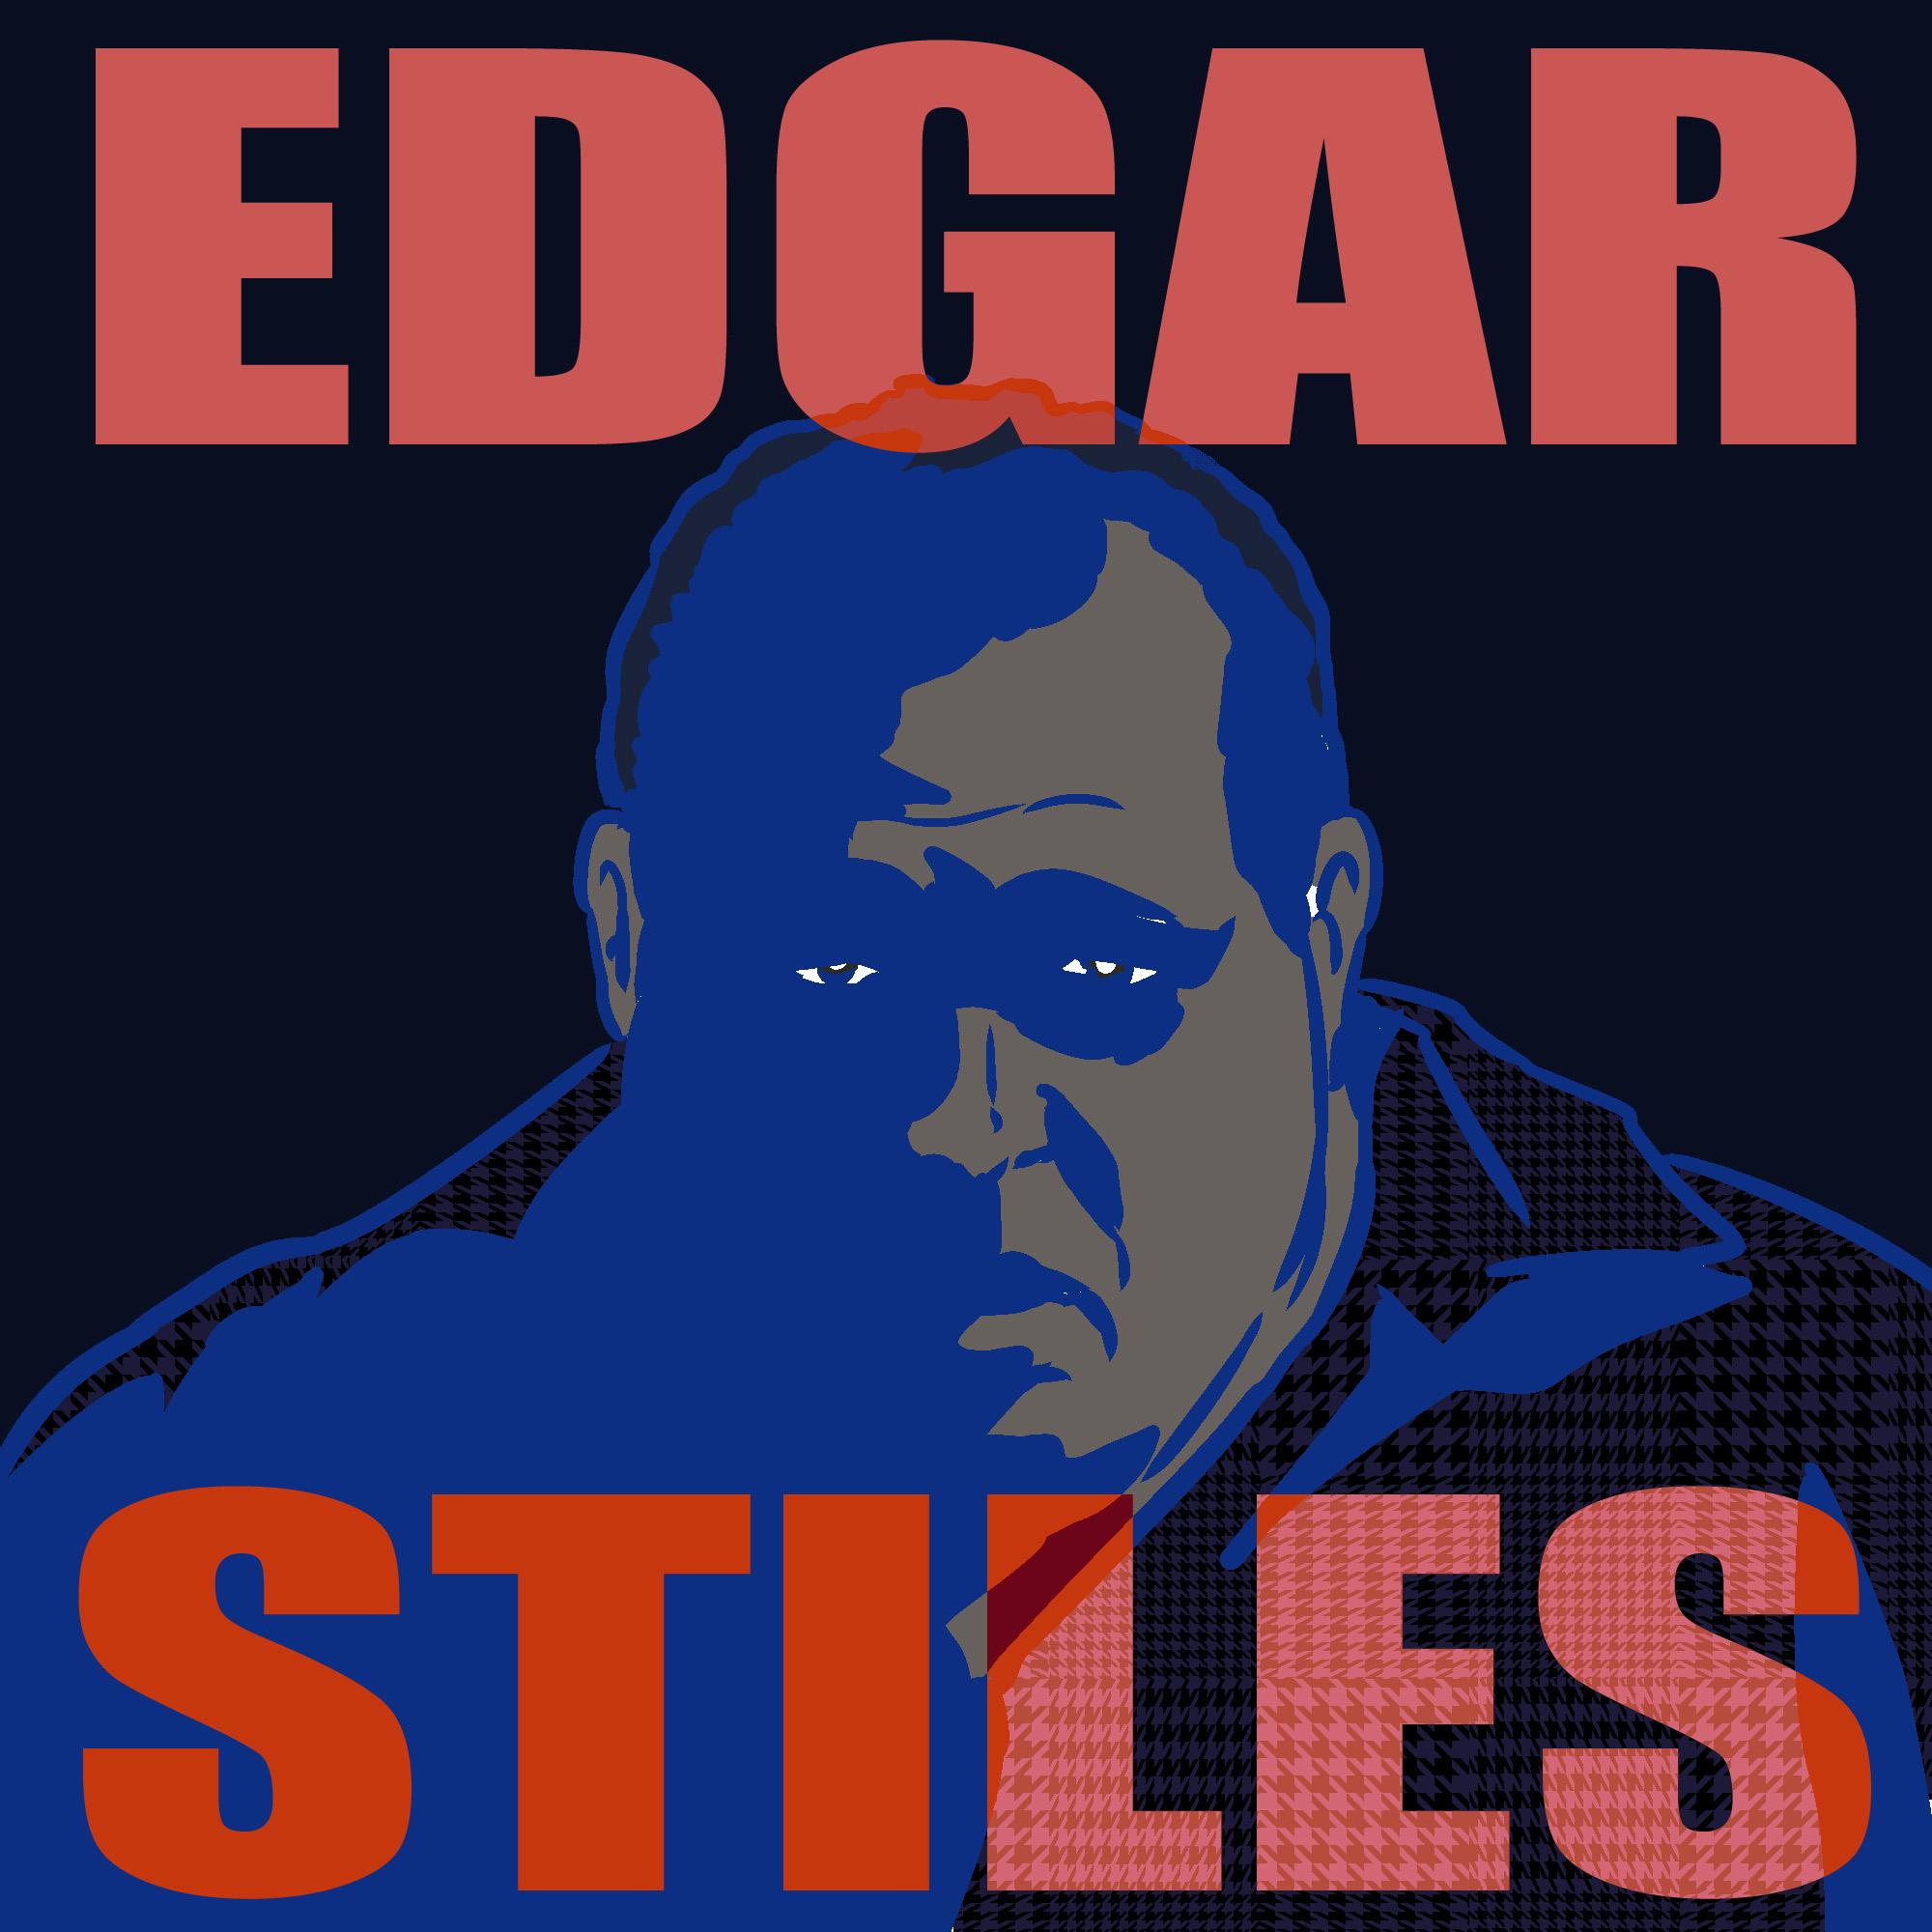 EDGAR1